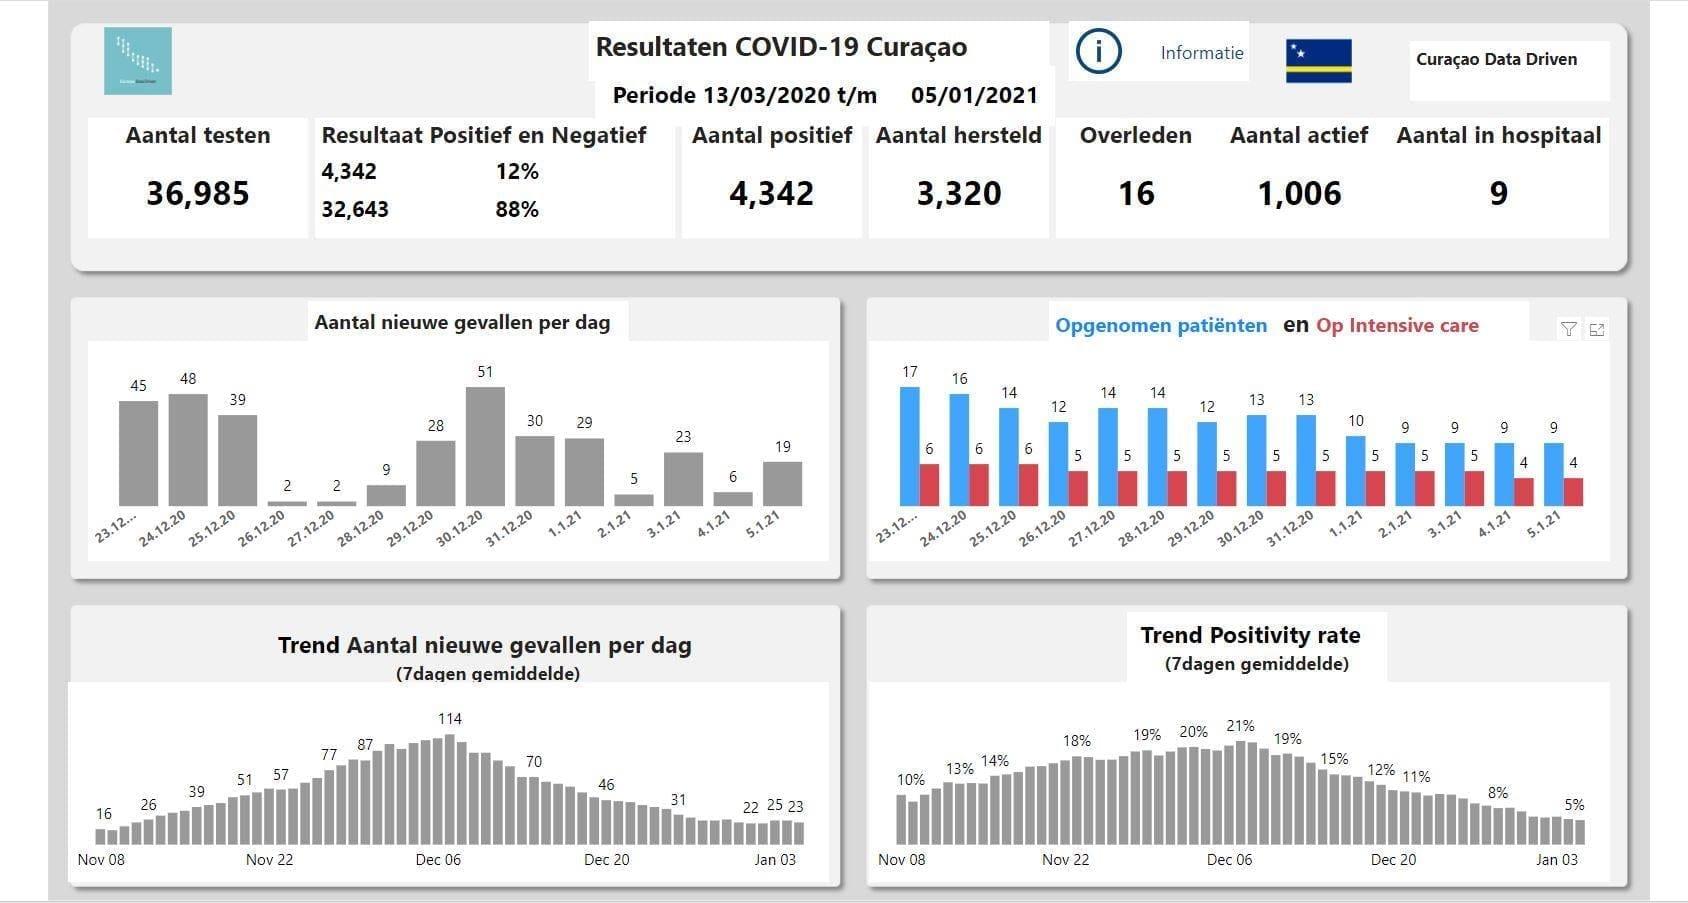 Curacao Data Driven - corona cijfers